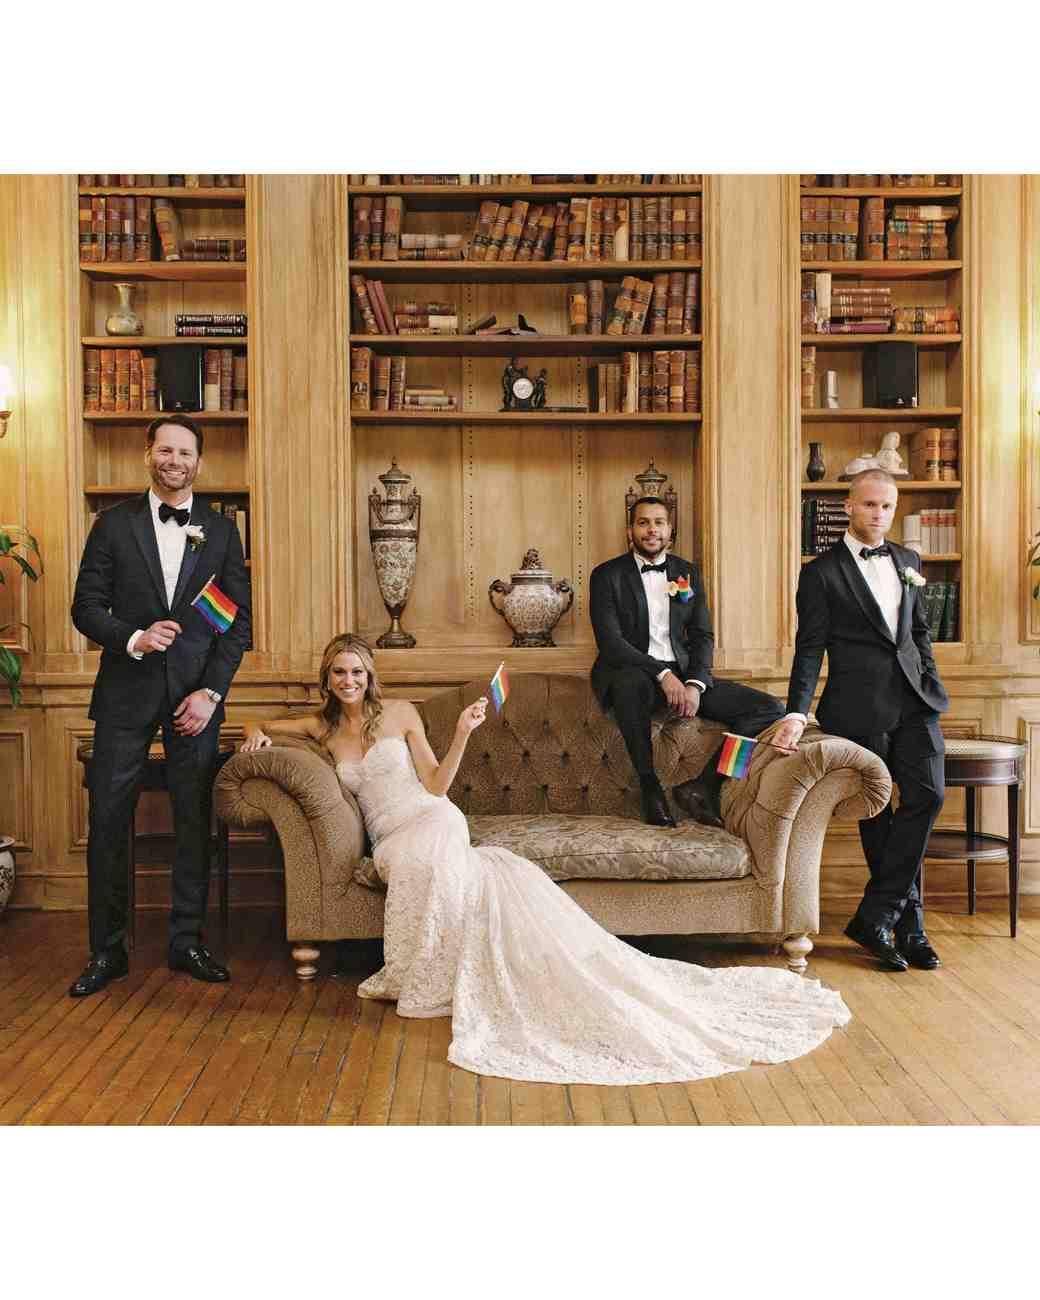 rebecca-david-wedding-new-york-bride-ushers-rainbow-flags-245-d112241.jpg